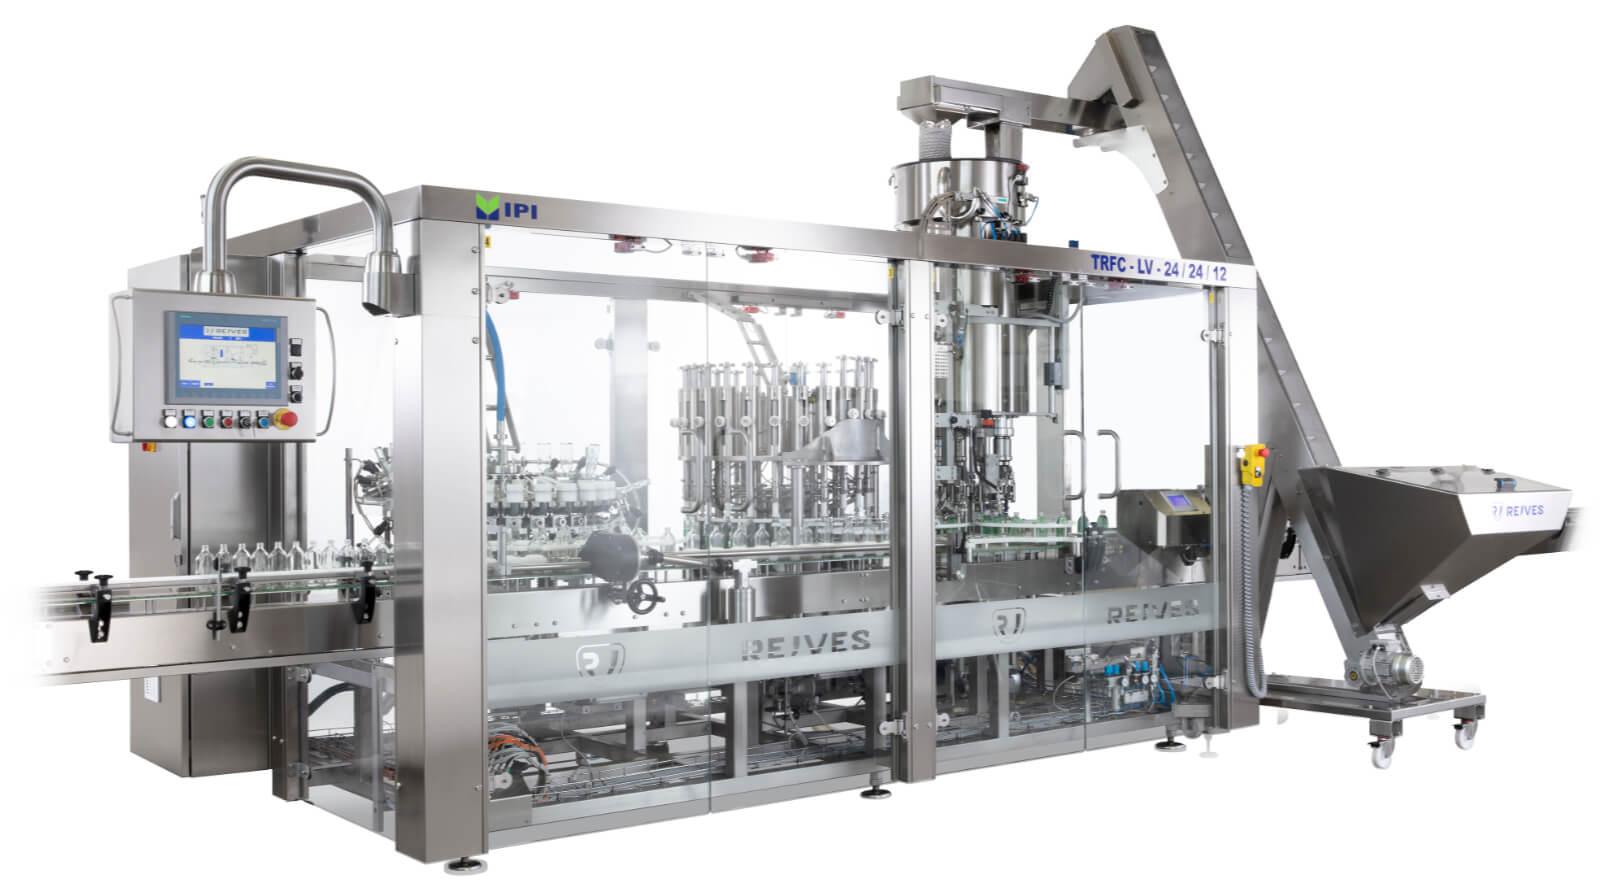 rejves machinery rotary monoblocs